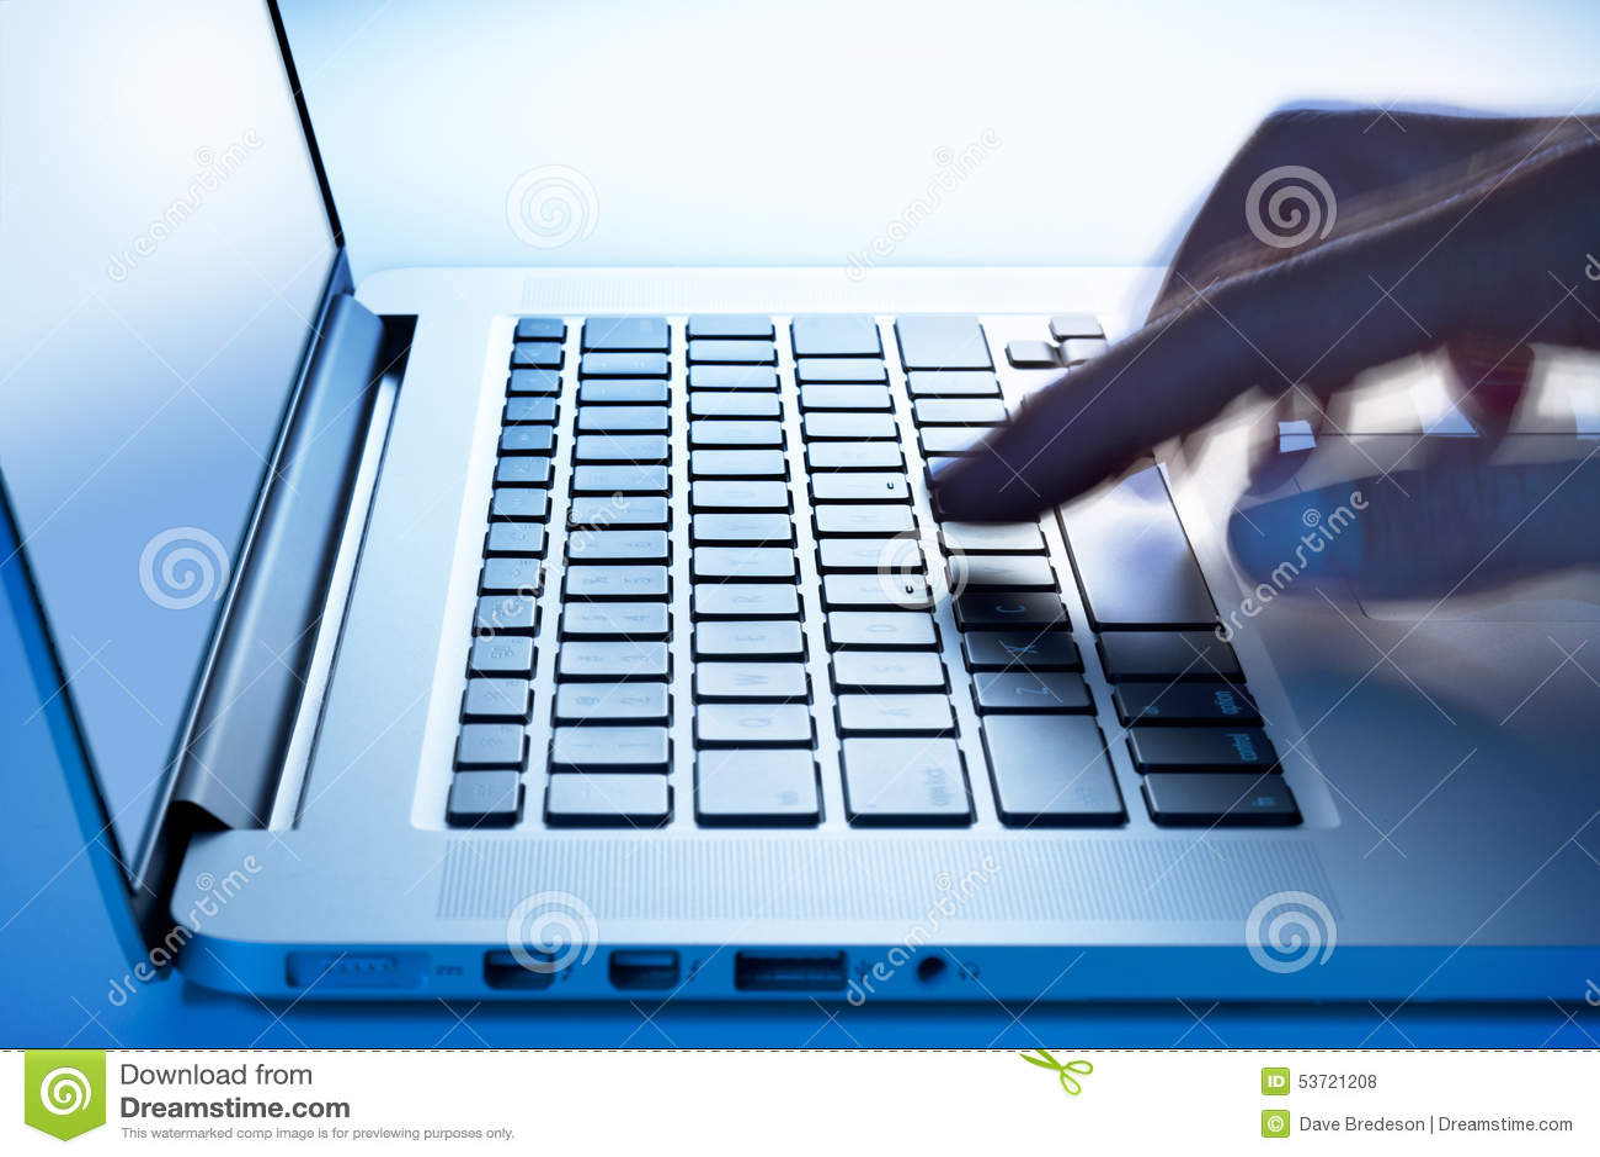 Business Computer Laptop Hand